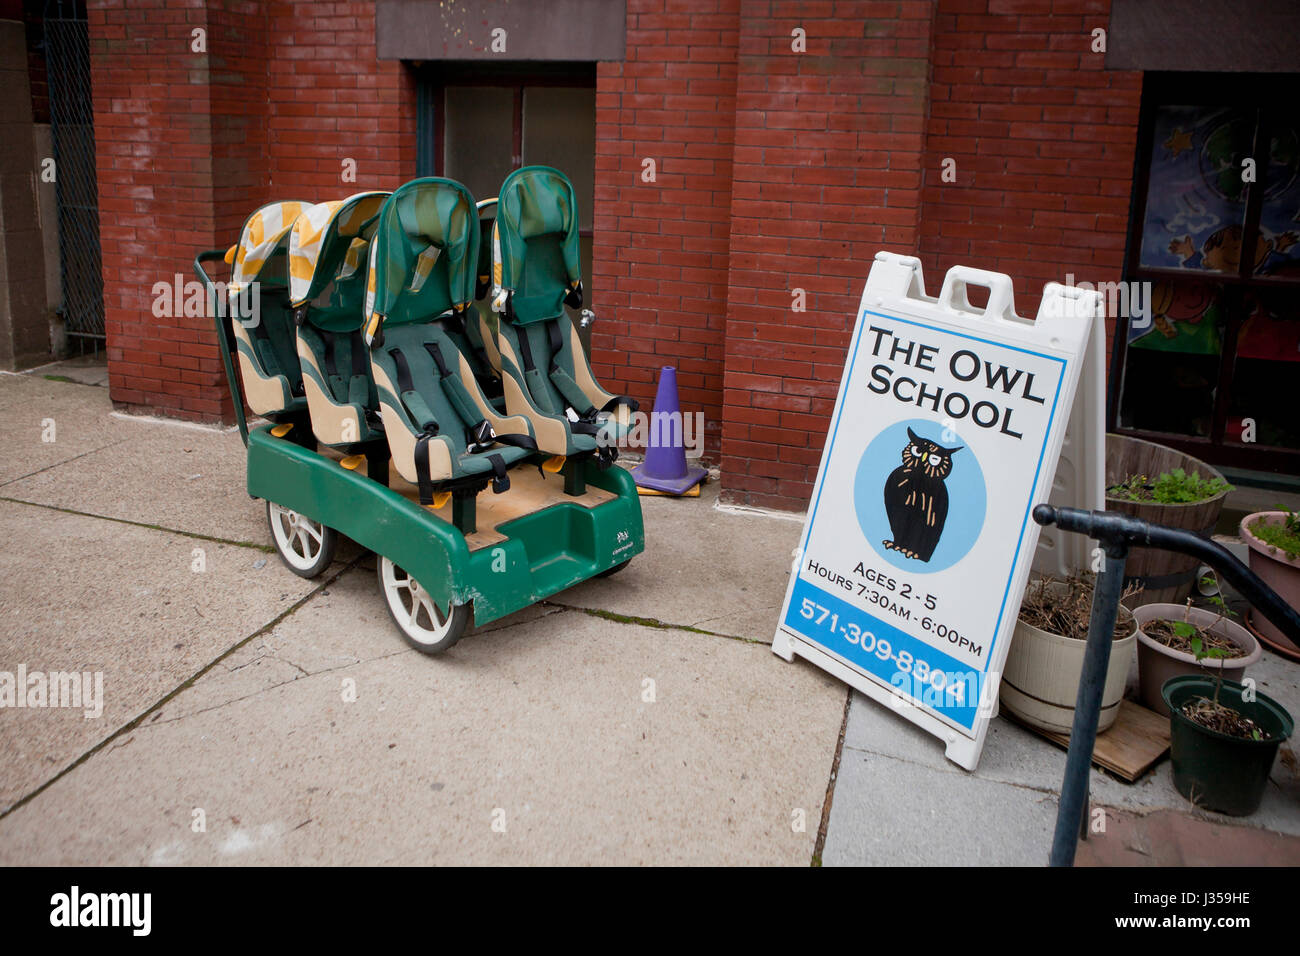 The Owl School, private preschool childcare - Washington, DC USA Stock Photo